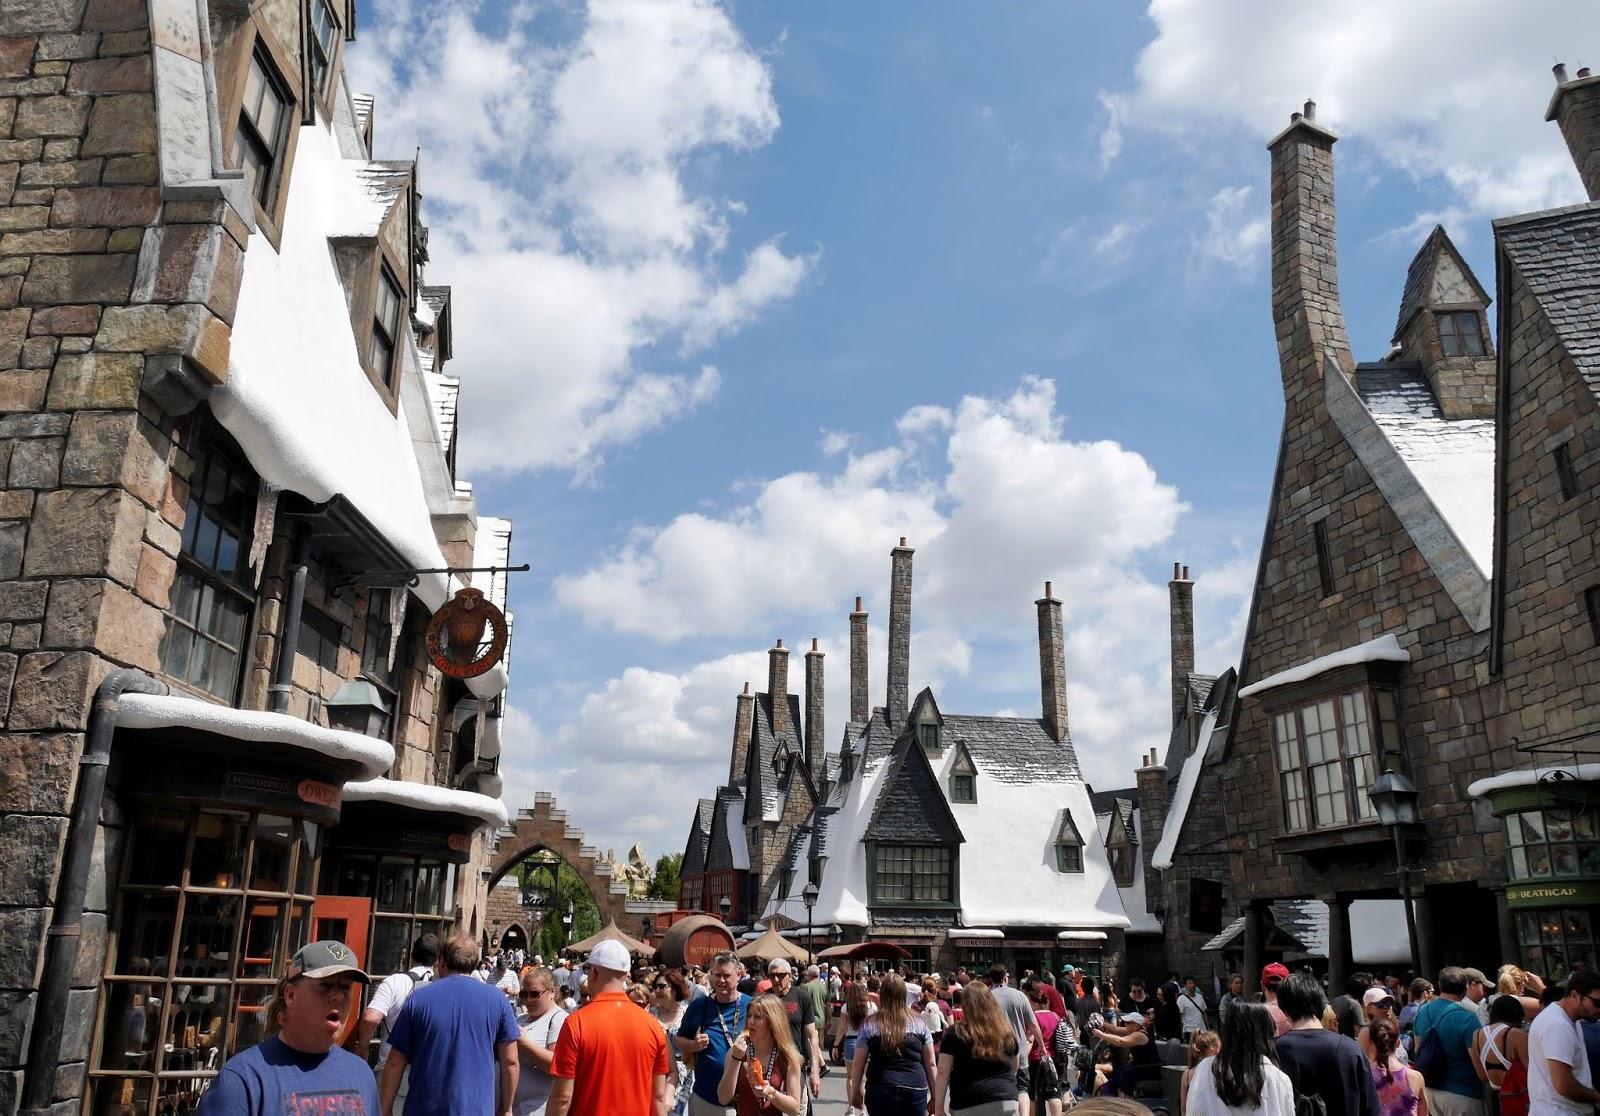 Hogsmeade Village at Universal Studios Orlando